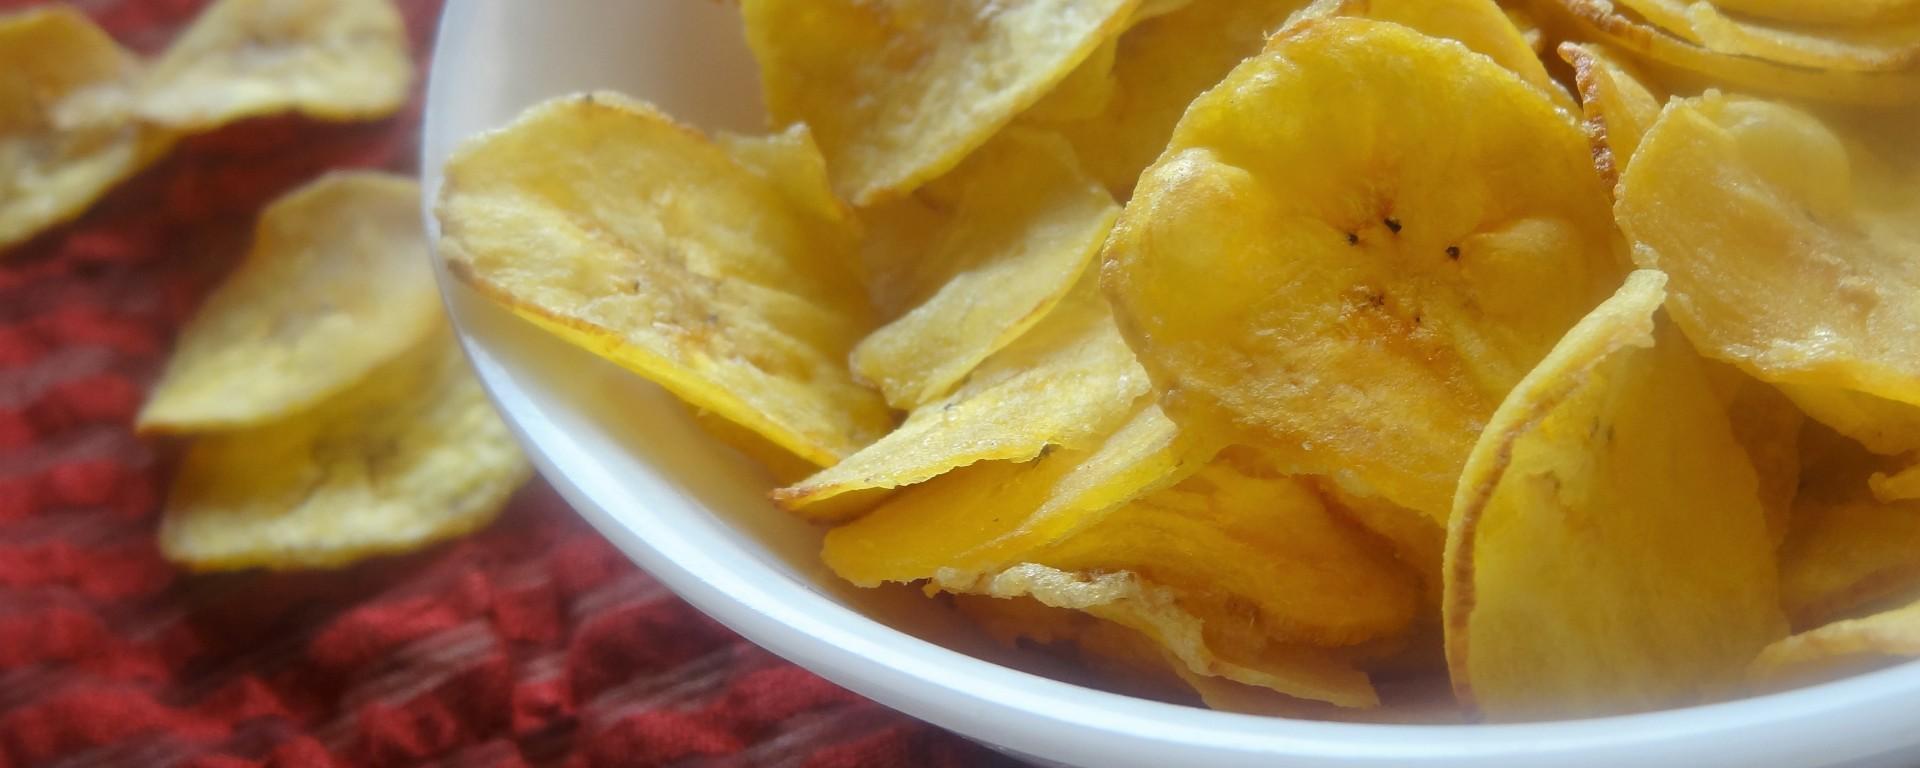 Raw banana chips/nendhranghai chips